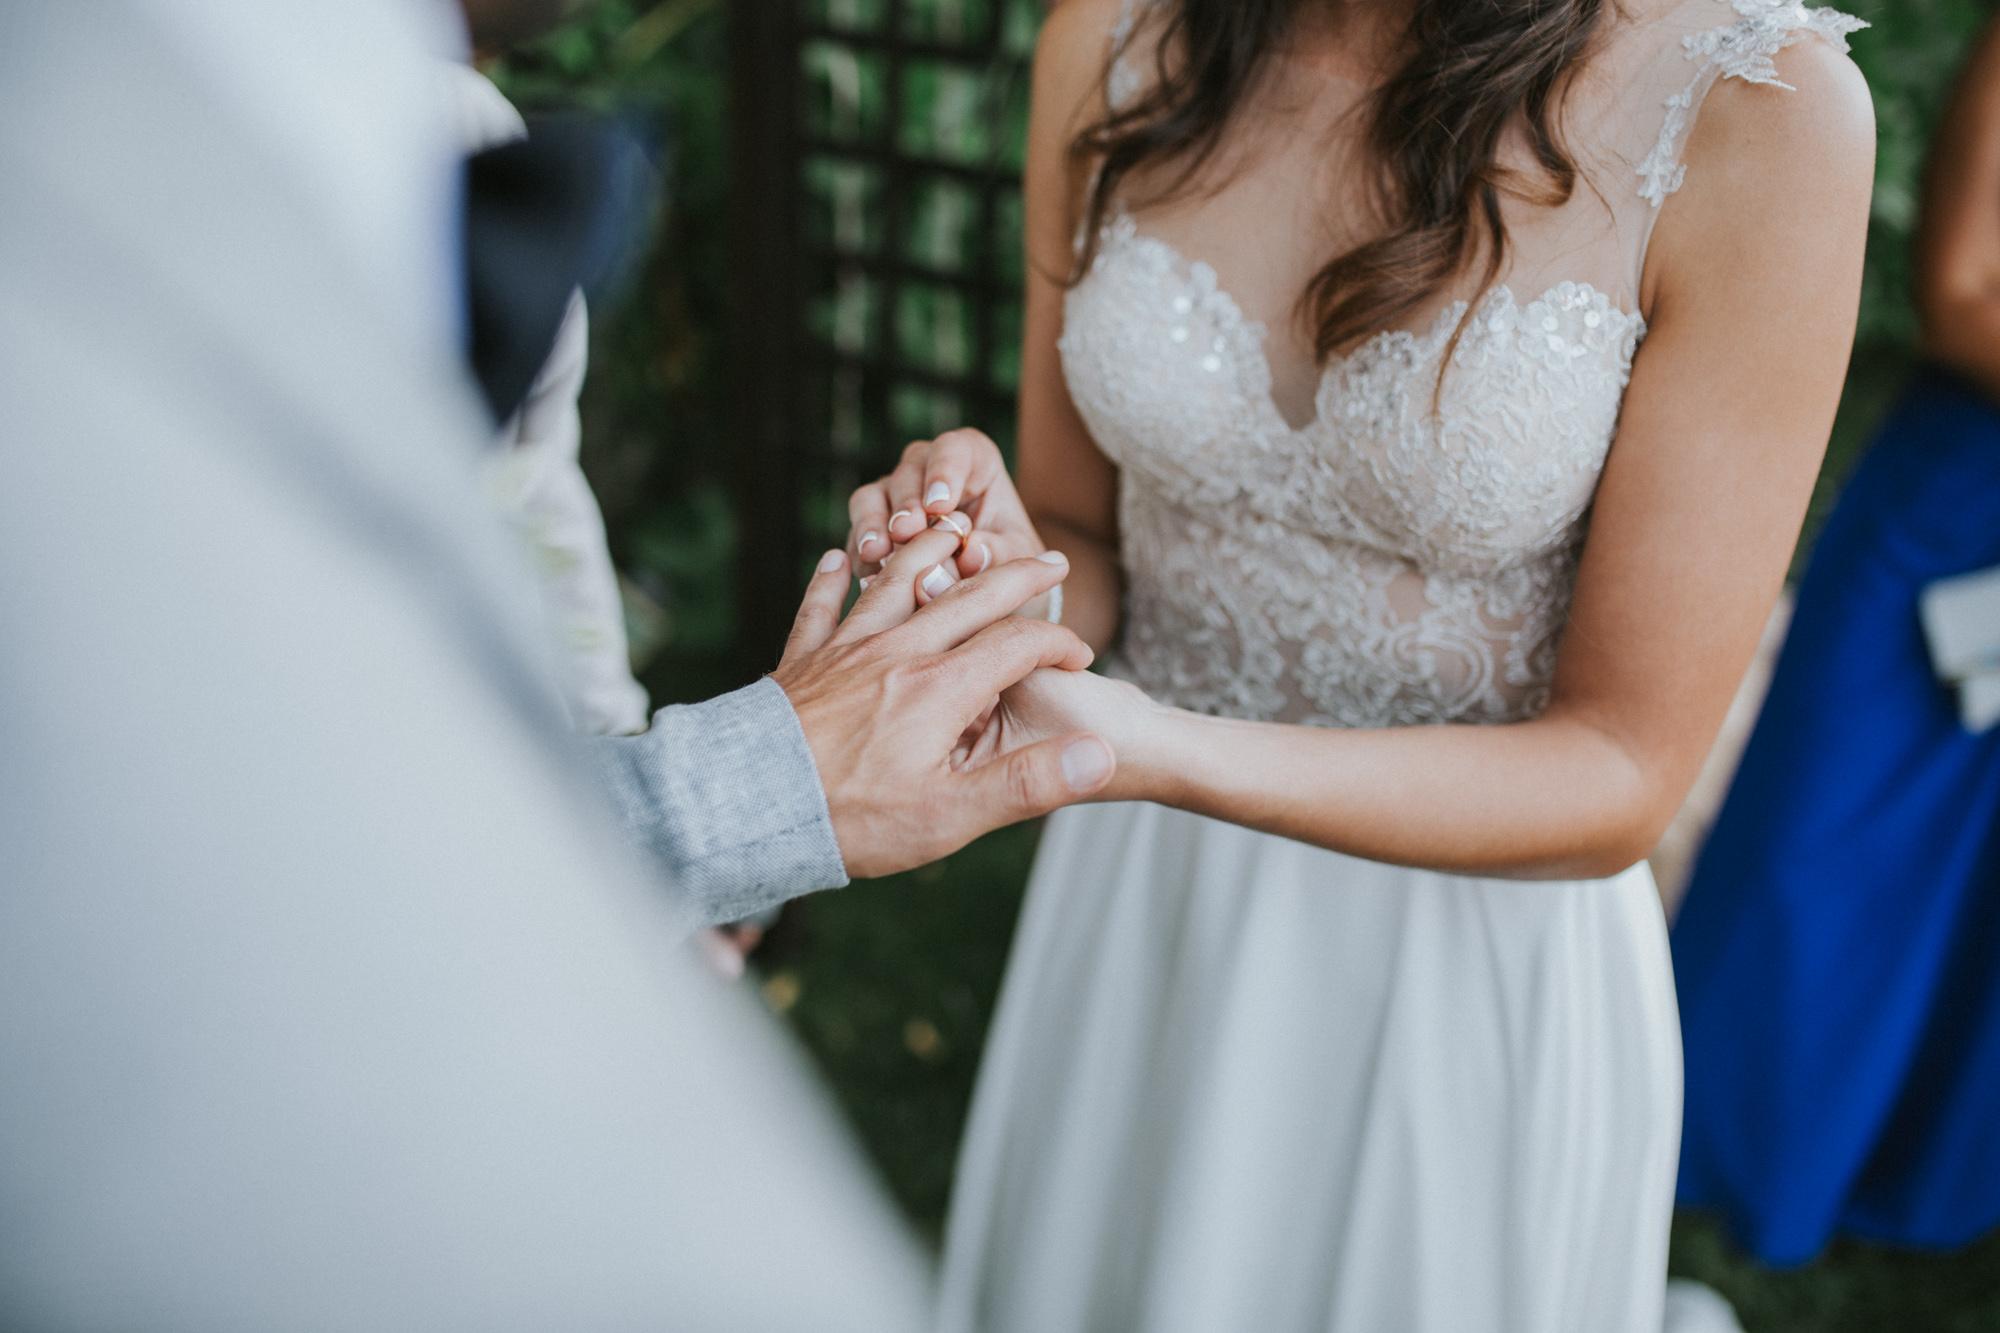 045-carina-e-samuel-wedding-casamento-quinta-dos-rouxinois-rustico-my-fancy-wedding-mafra-malveira-lisboa-sintra-cascais-filipe-santiago-fotografia-fotografo-lifestyle-destination-portugal